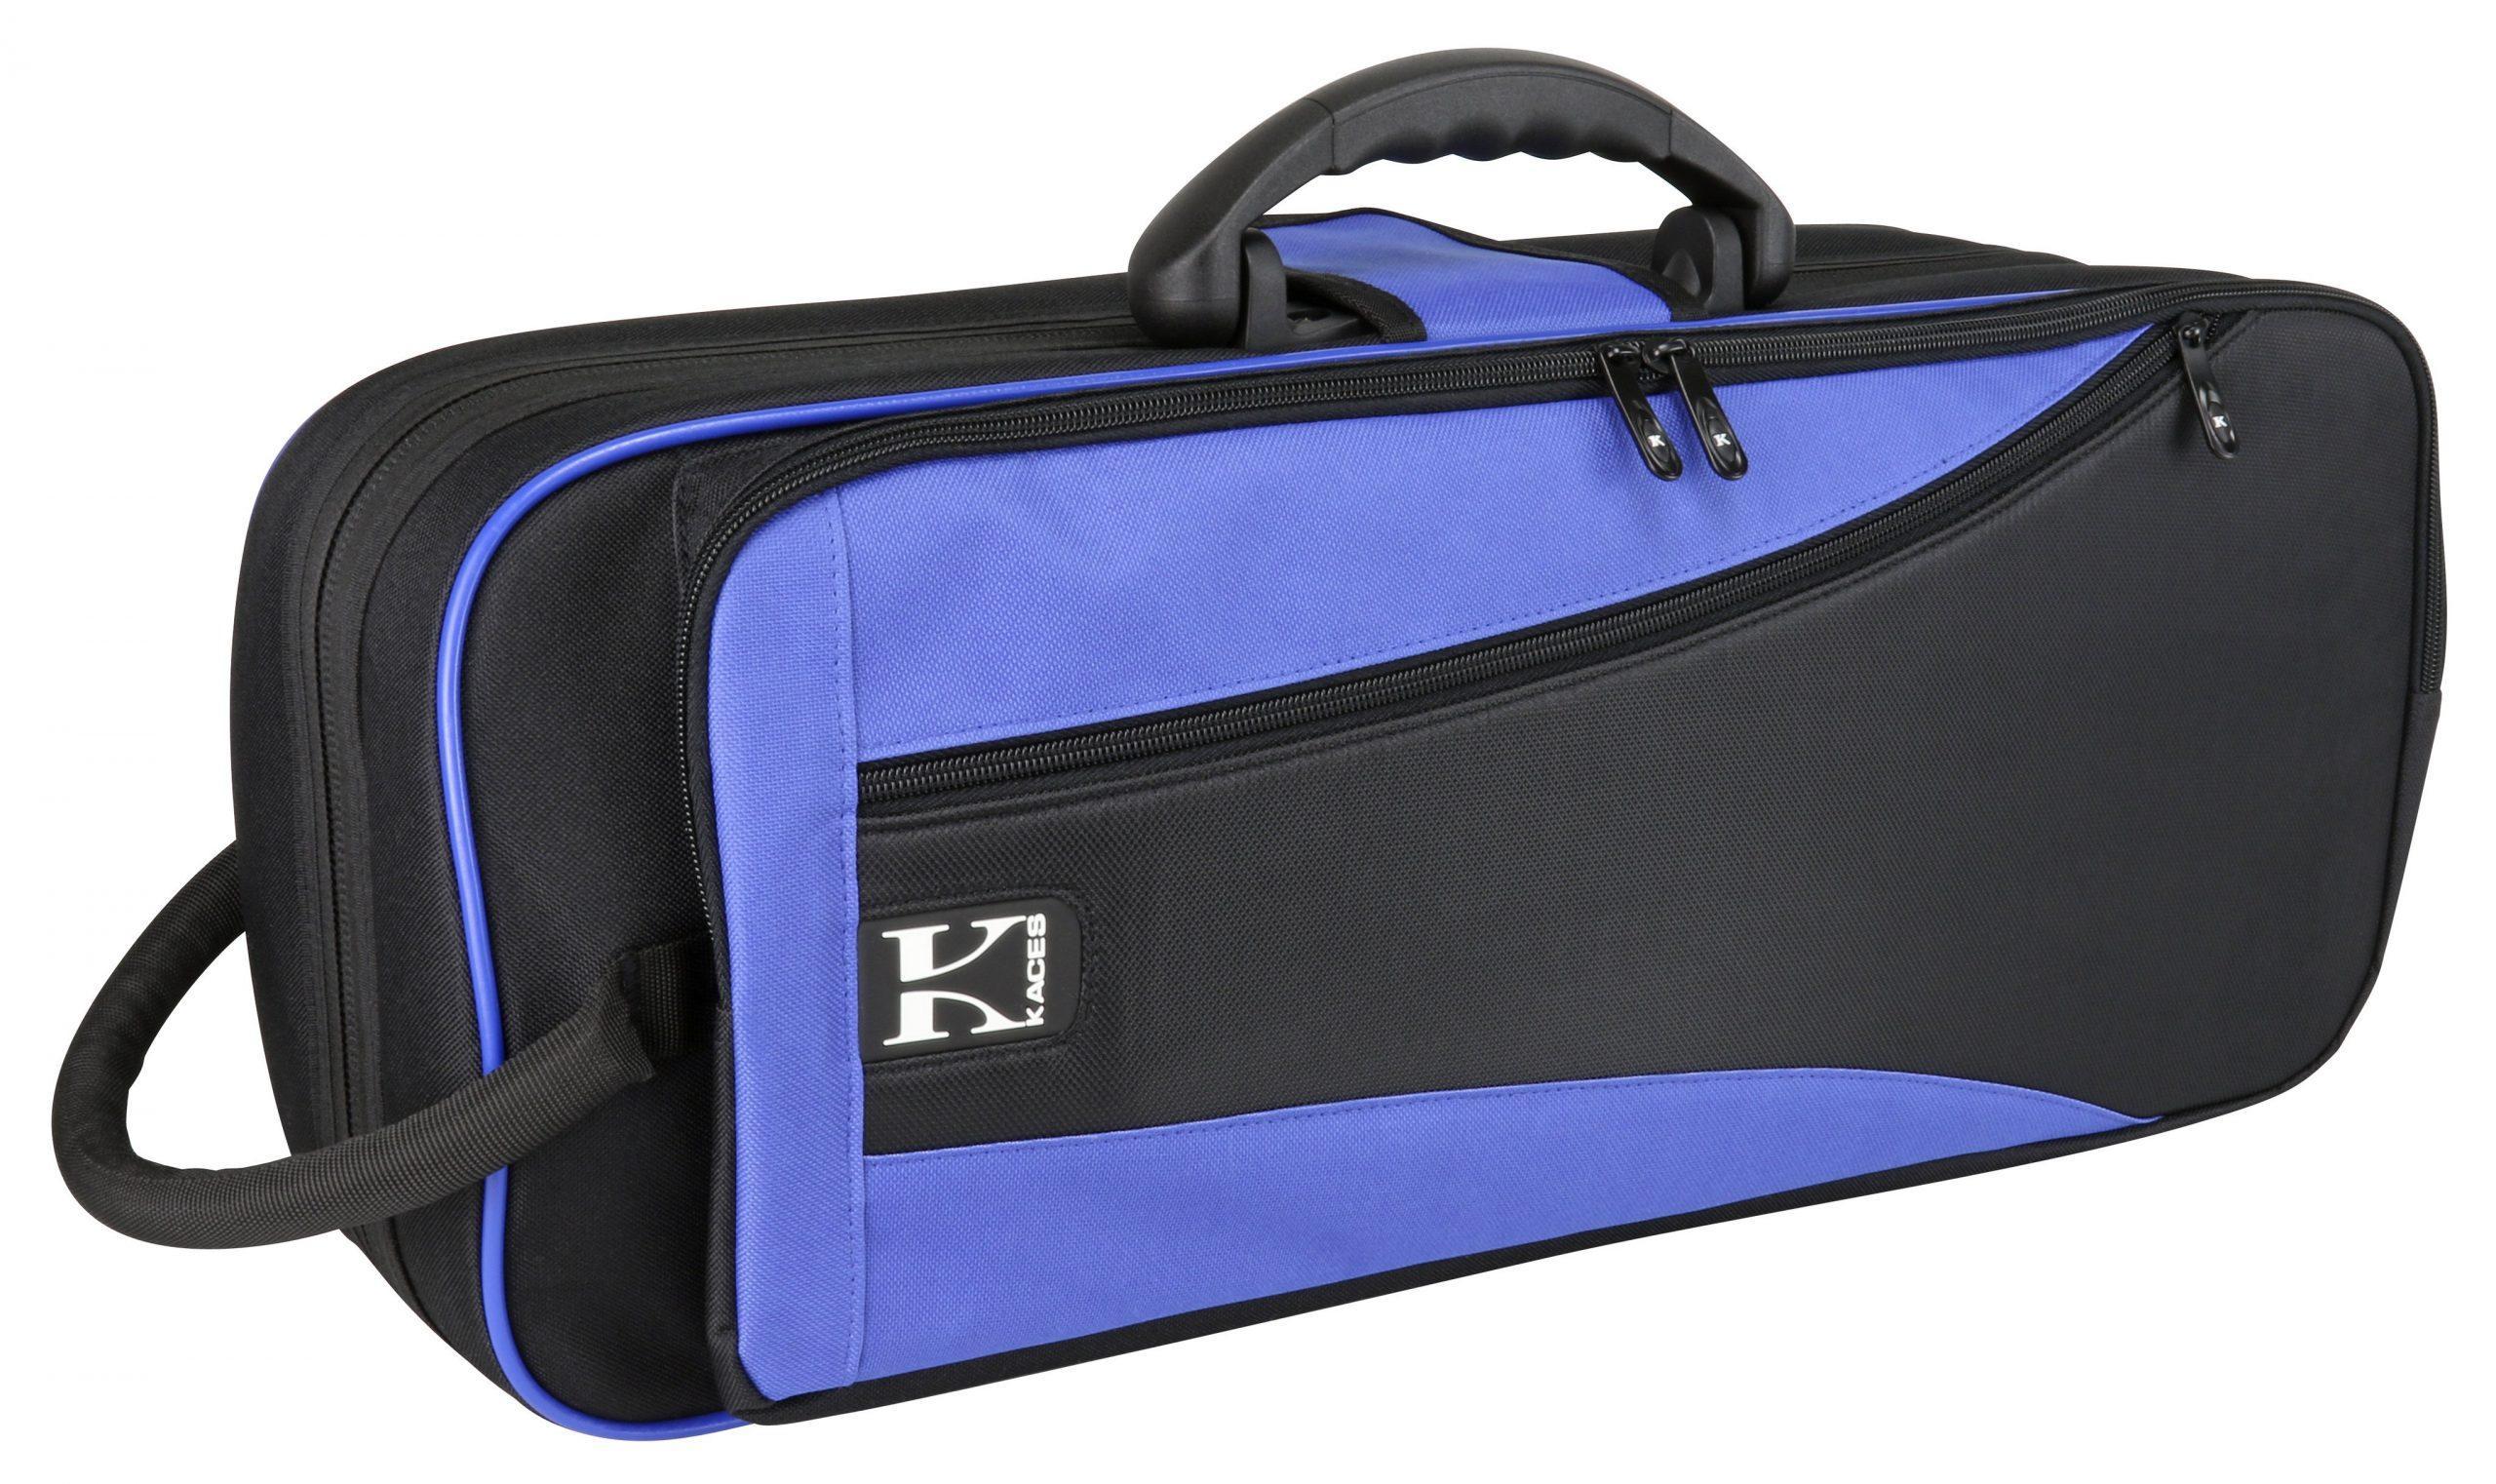 Kaces Lightweight Hardshell Trumpet Case, Blue